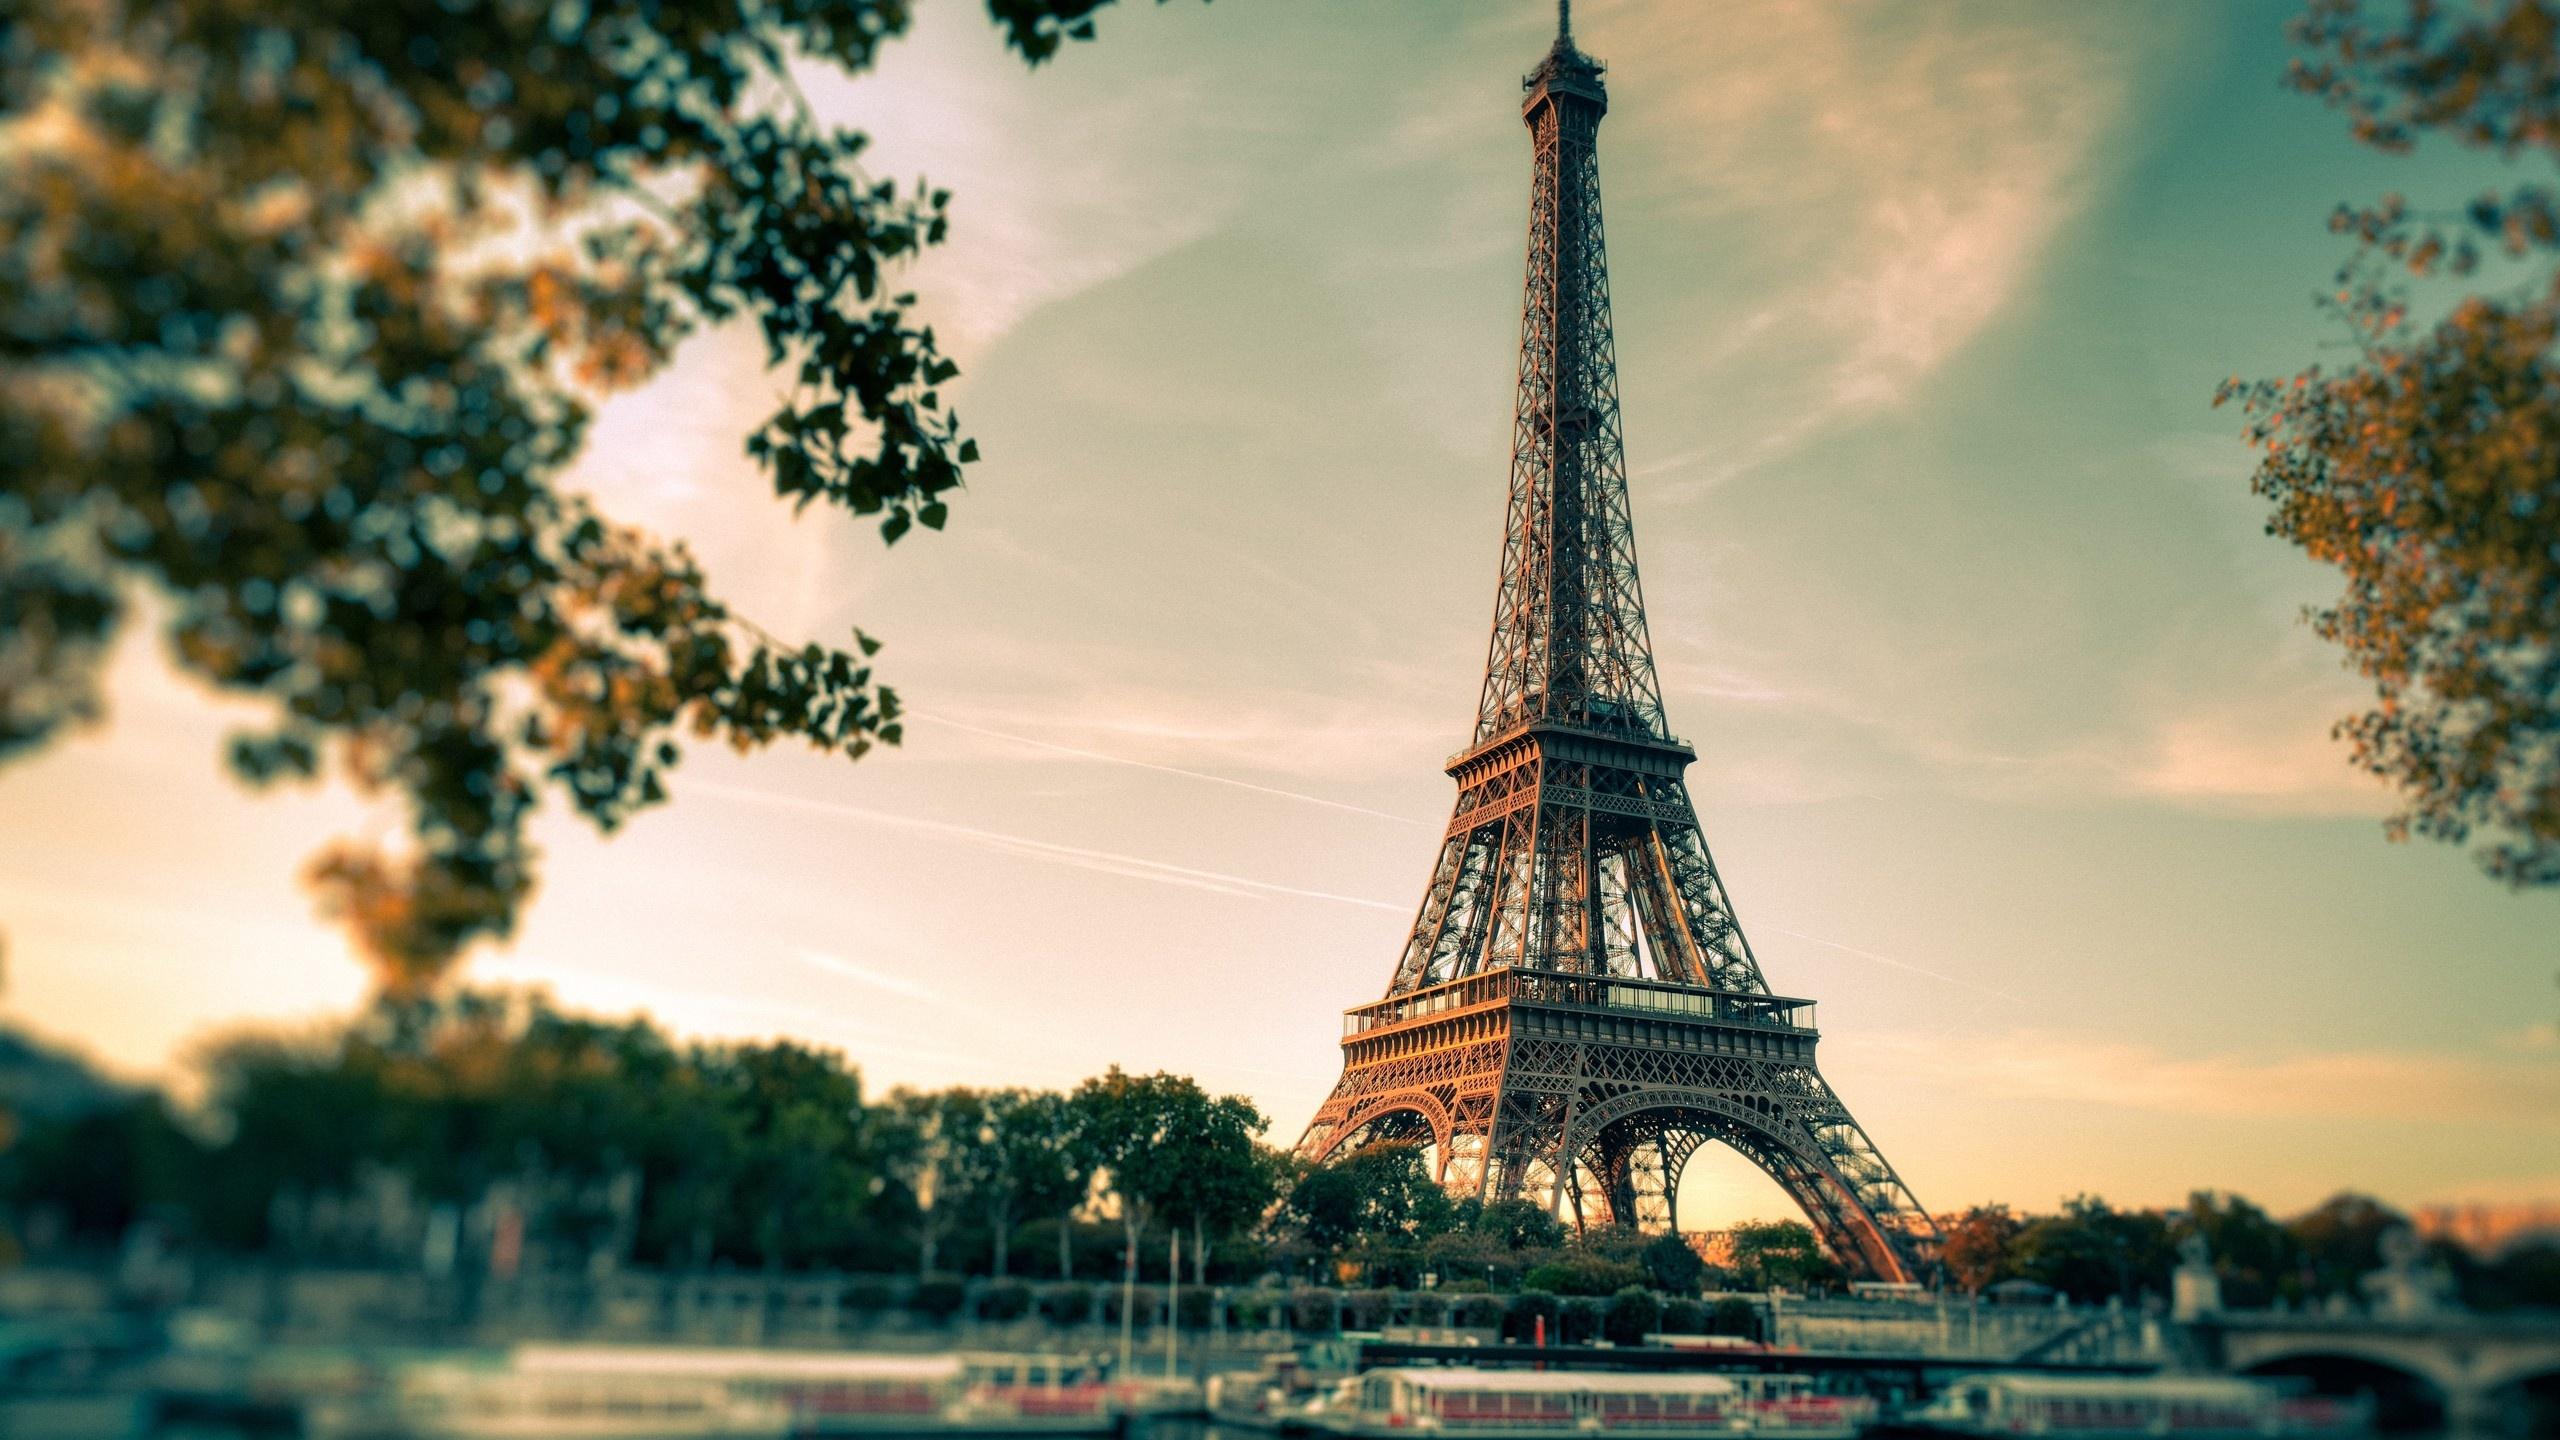 Eiffel Tower Paris Tumblr Wallpaper For Androi 7109 Wallpaper High 2560x1440